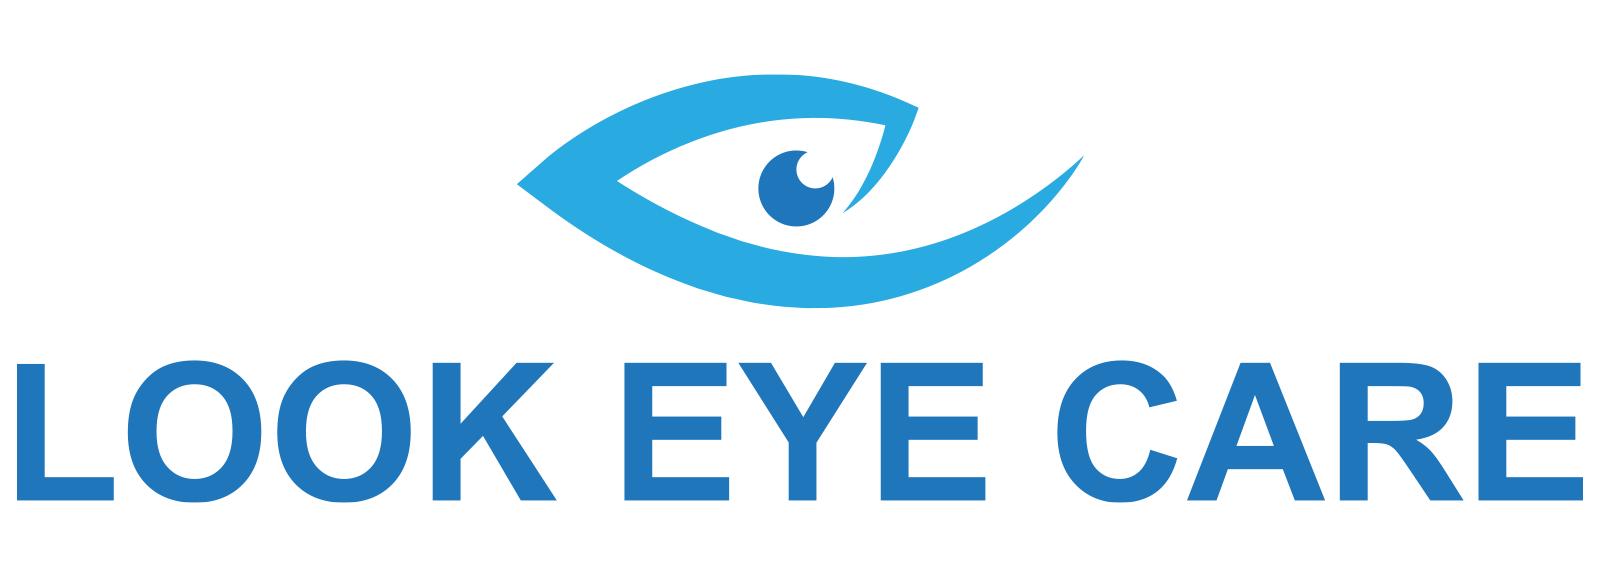 Look Eye Care Winnipeg Optometrist Dr Mani Tangri Dr Sonal Trivedi Optometry